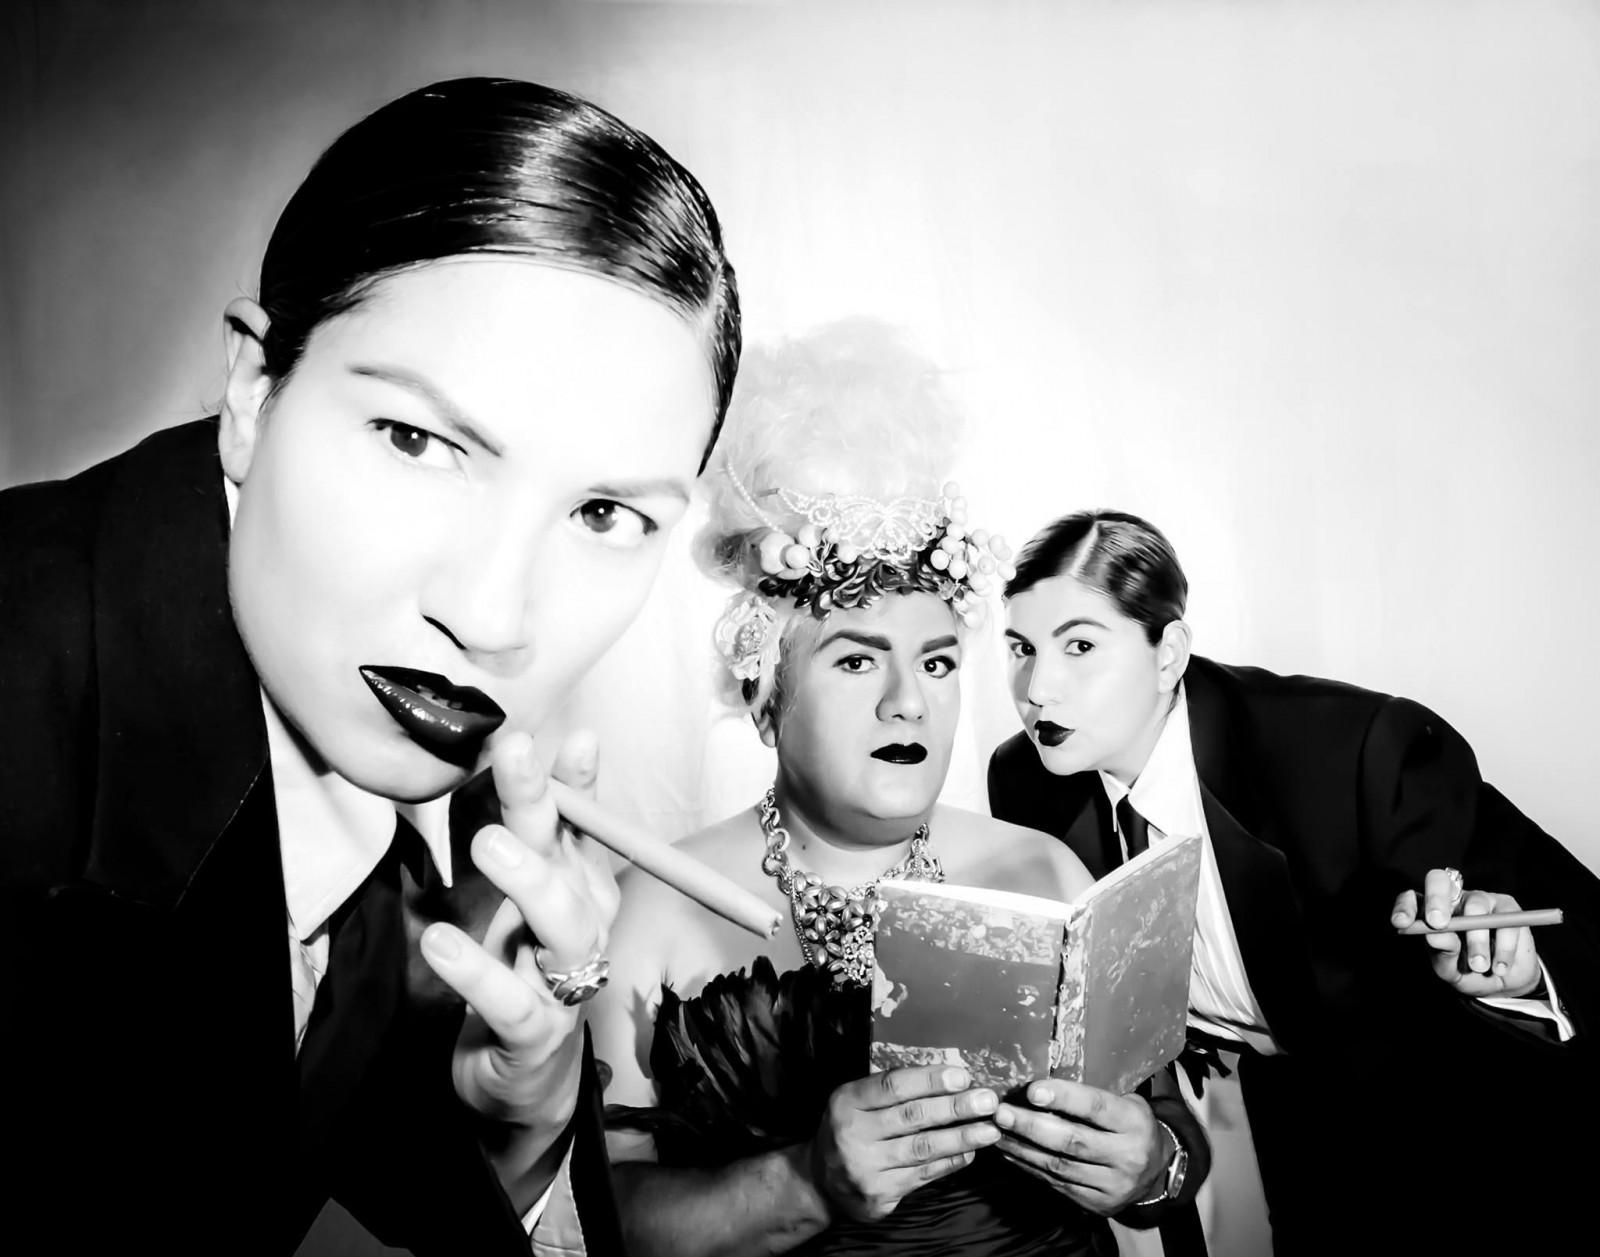 Cuellar (center) photographed by Kristel Puente